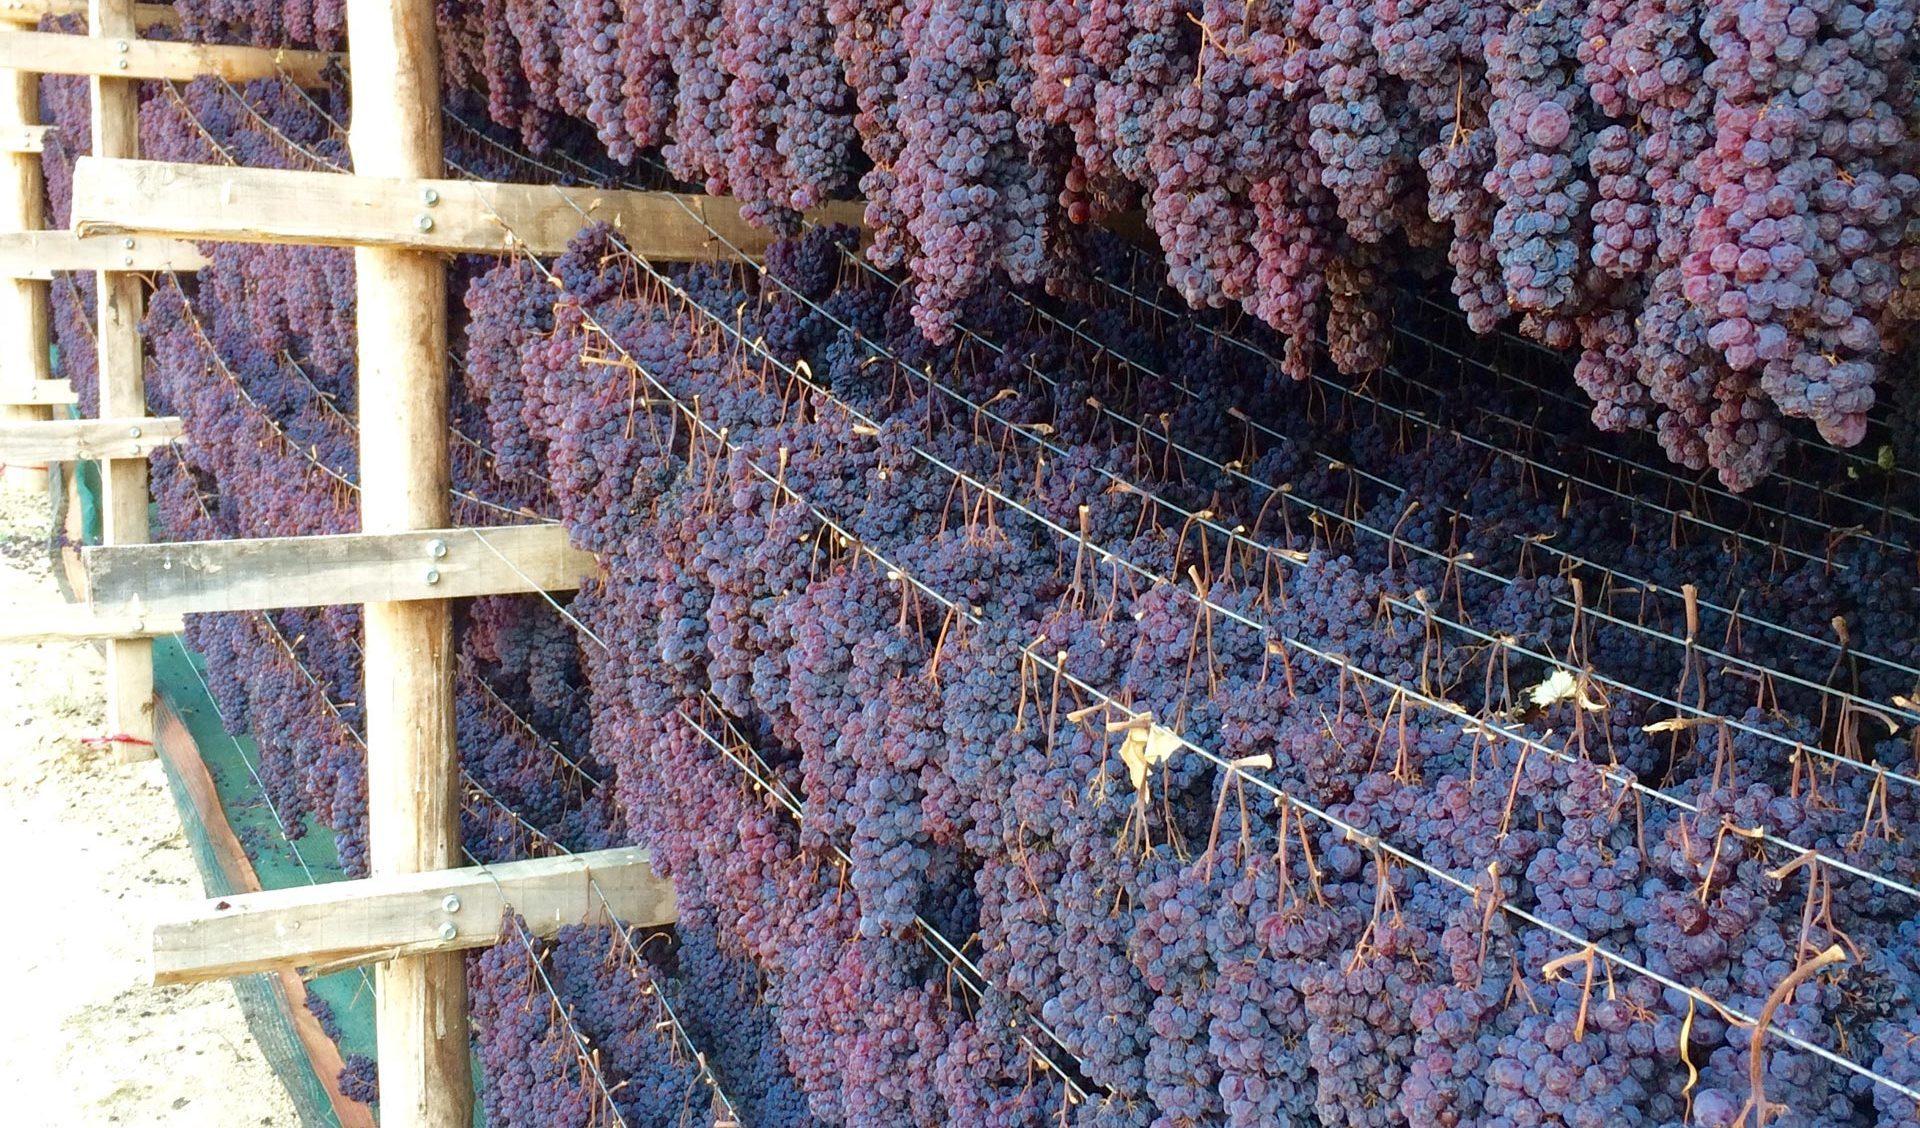 Grapes at Nemea, Tourism - Itineraries - Greek wine